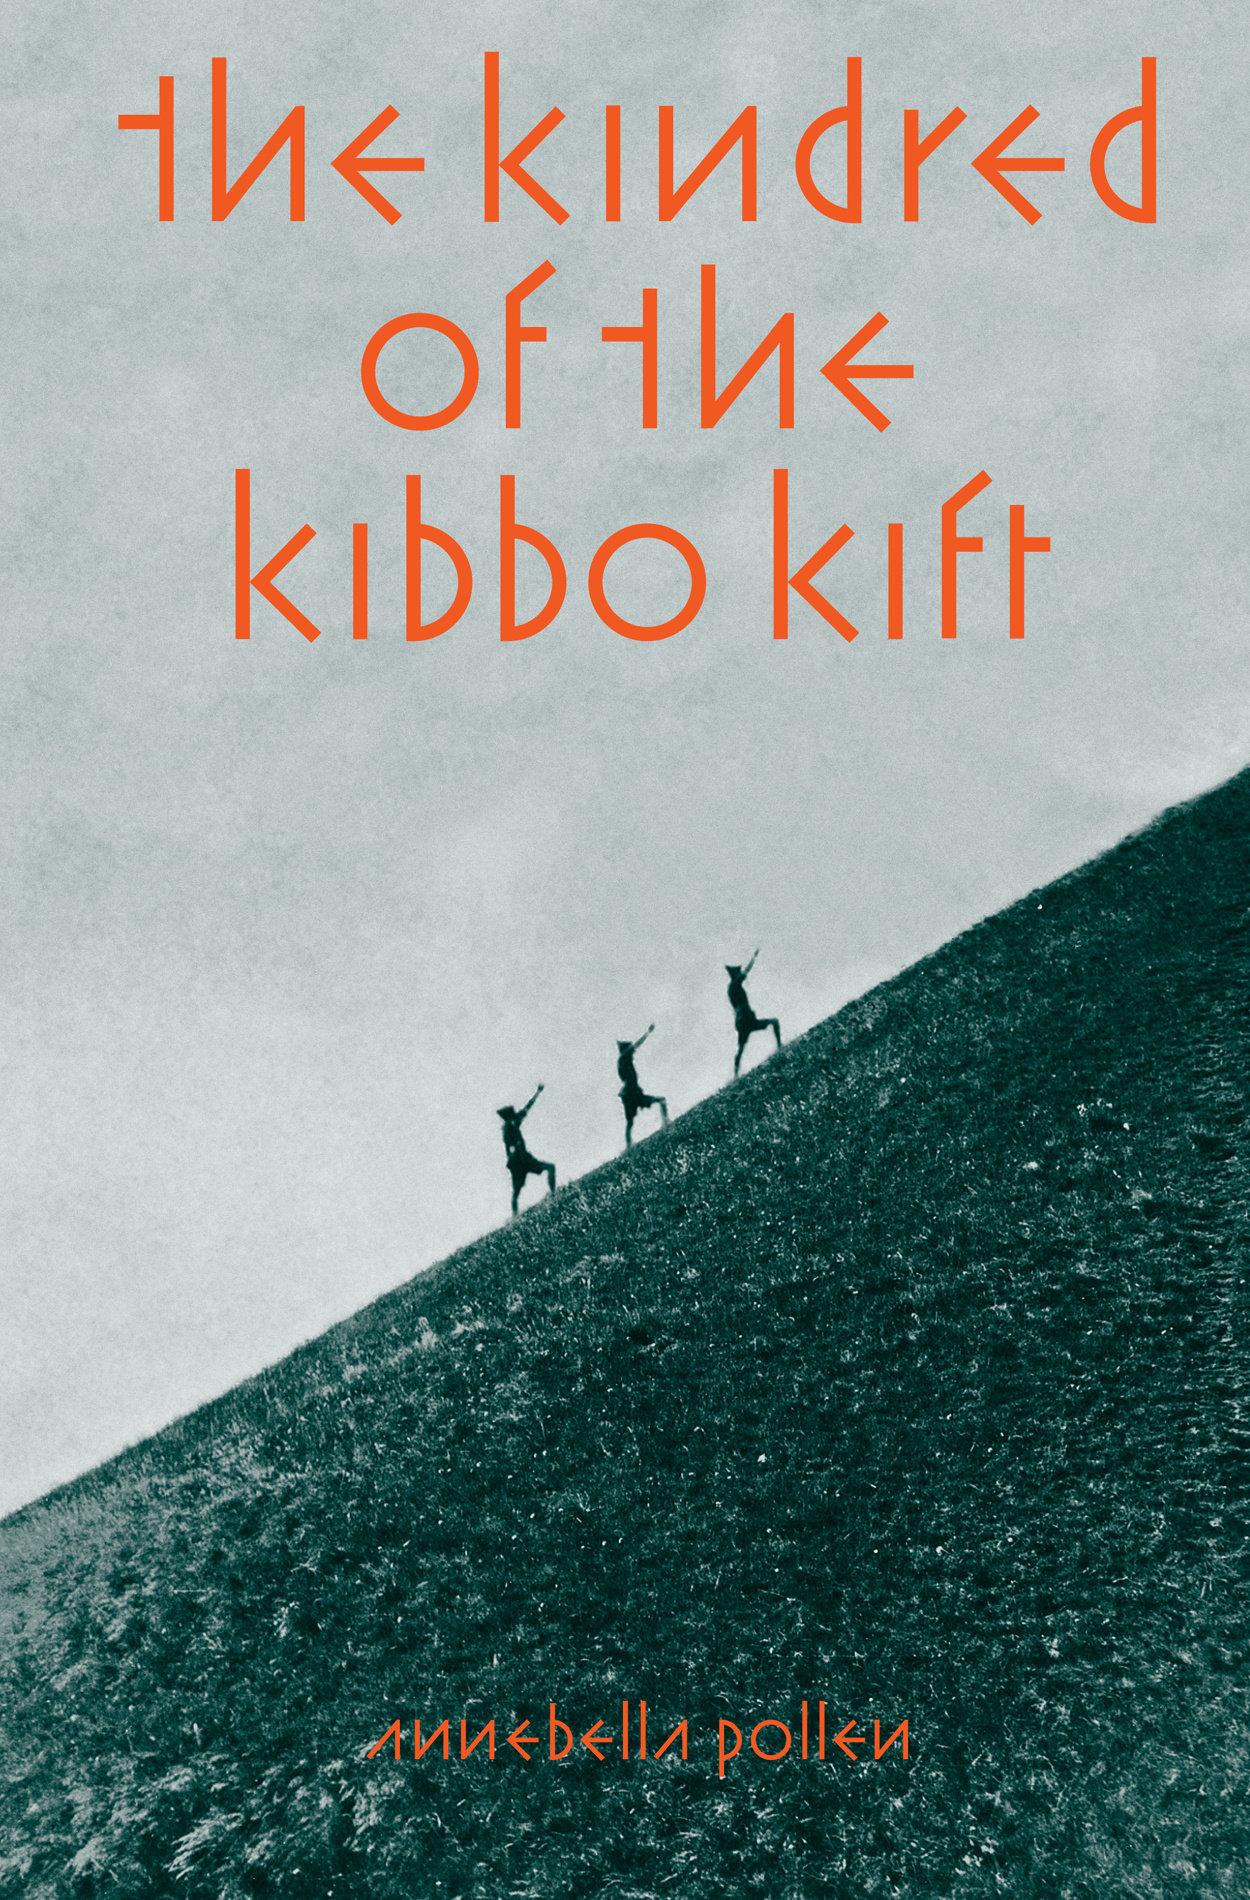 Cover.tif